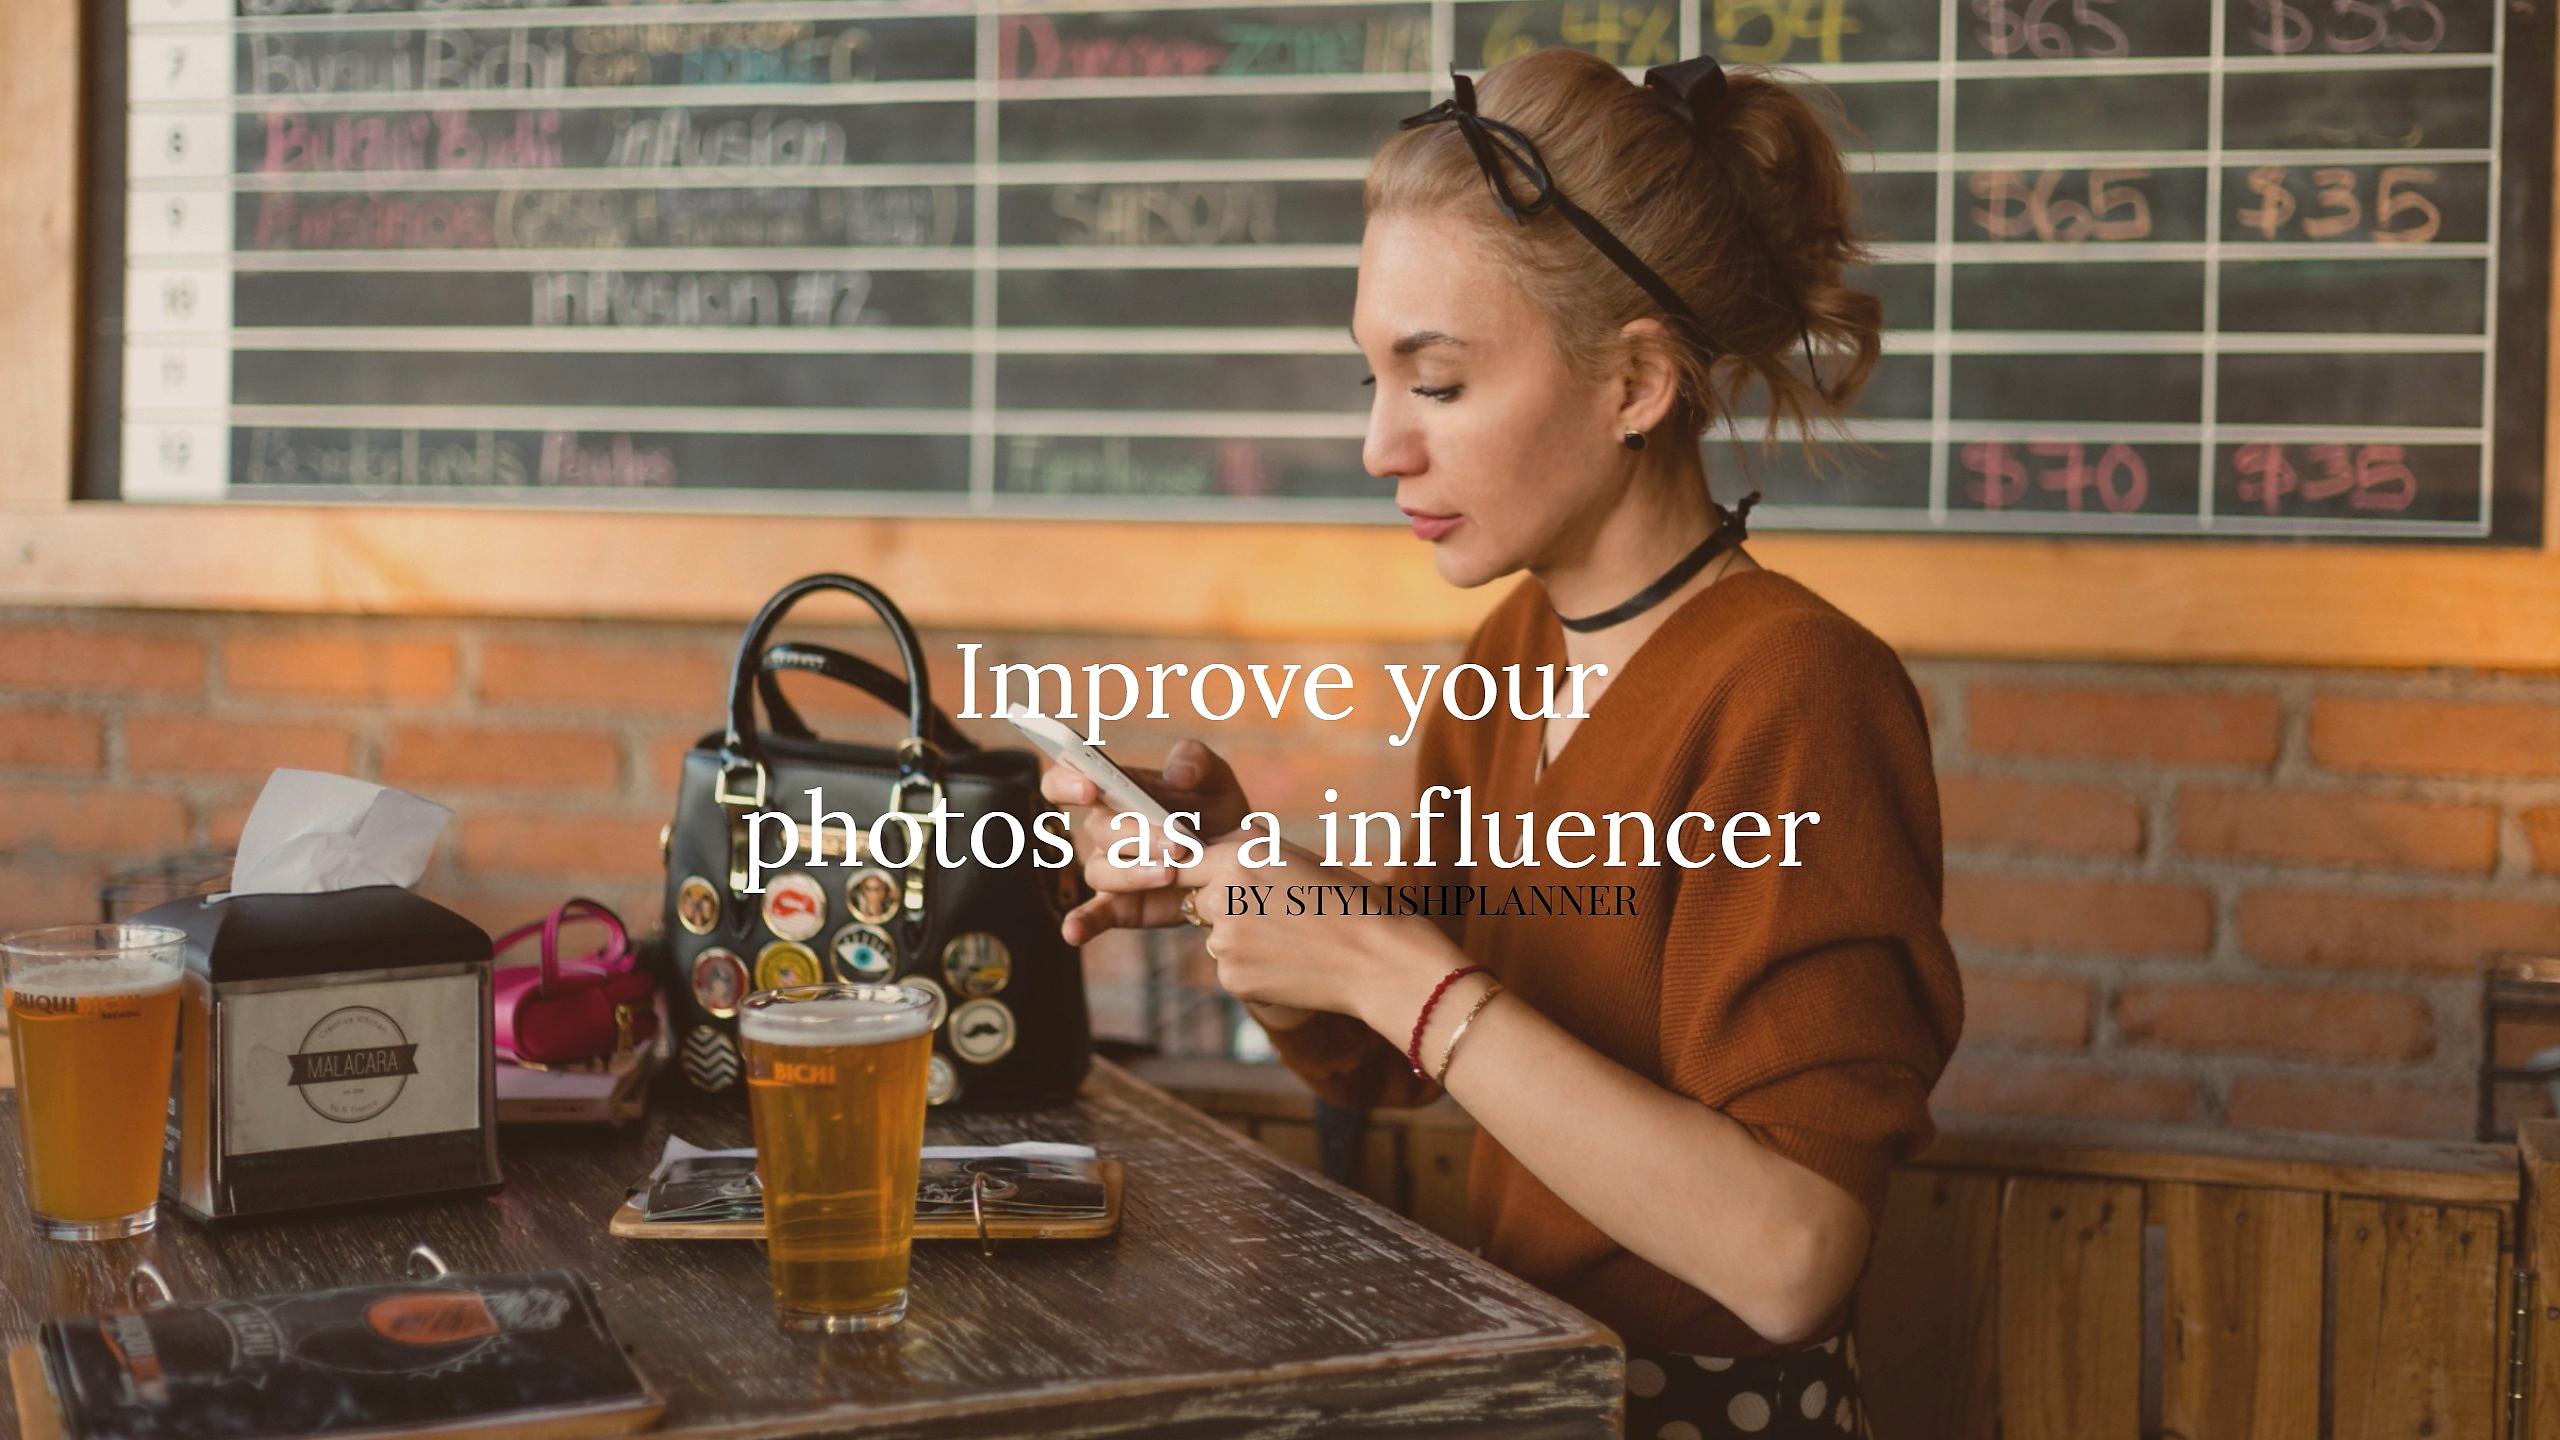 How to improve your photos as a influencer